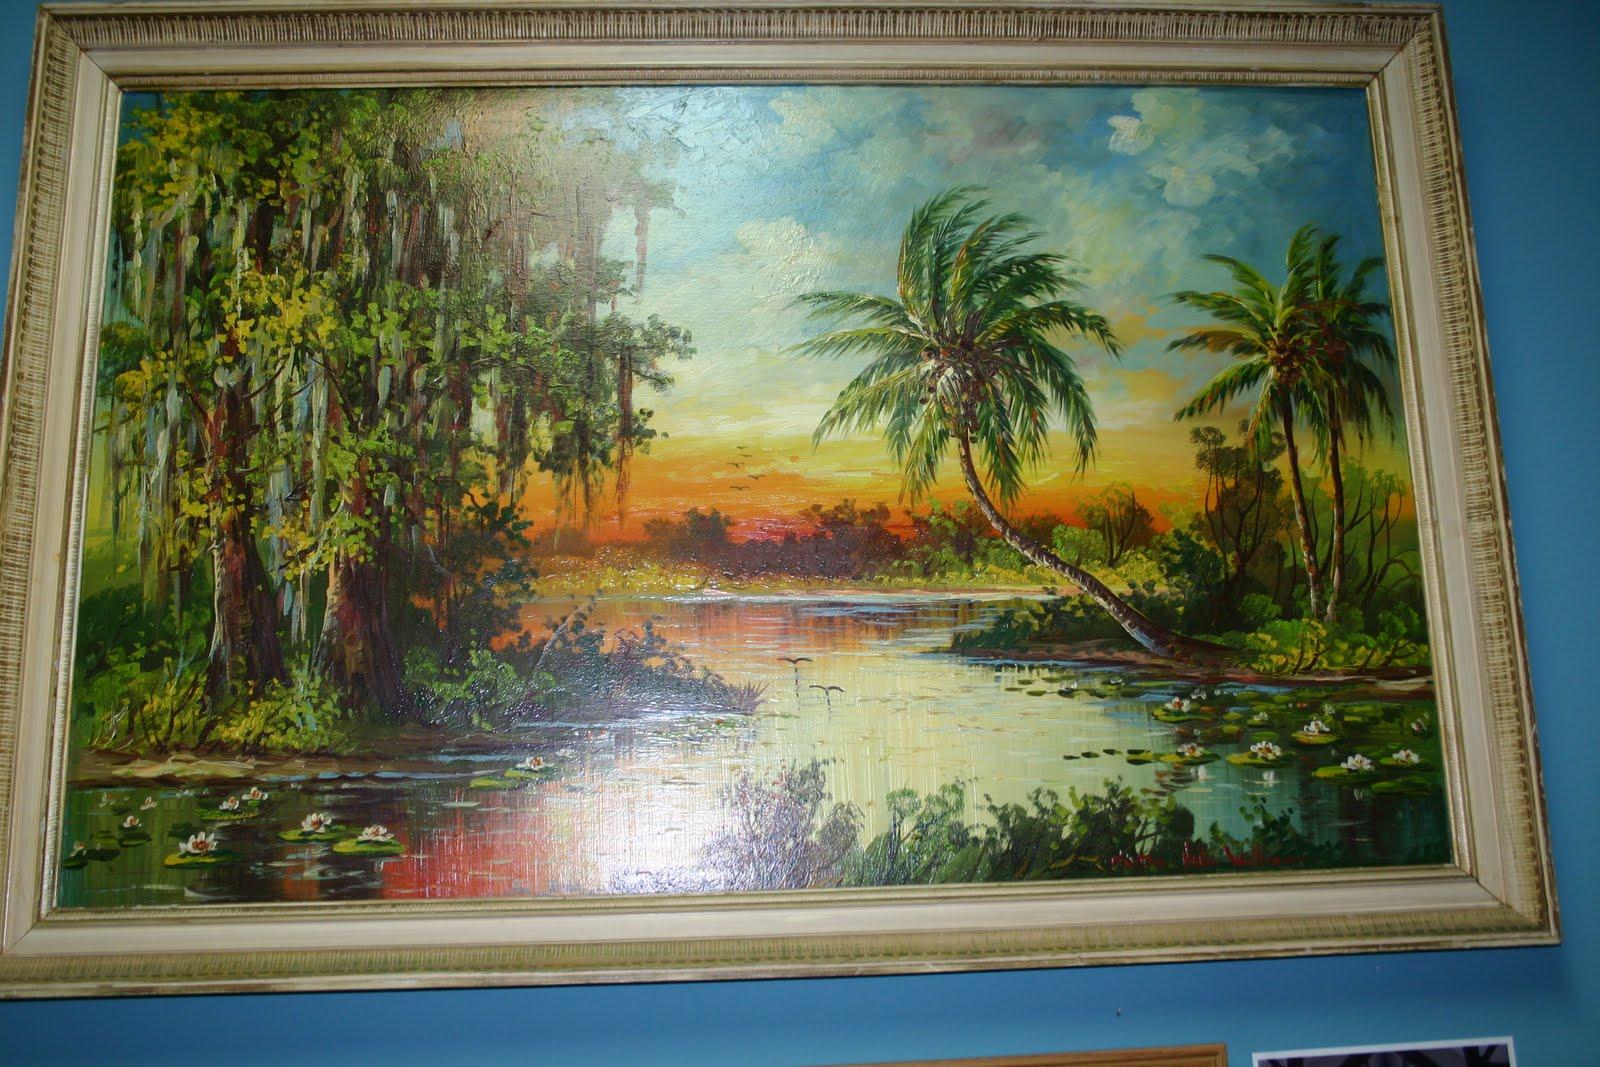 Oceans Pines Amp Palms Tourist Season In Florida